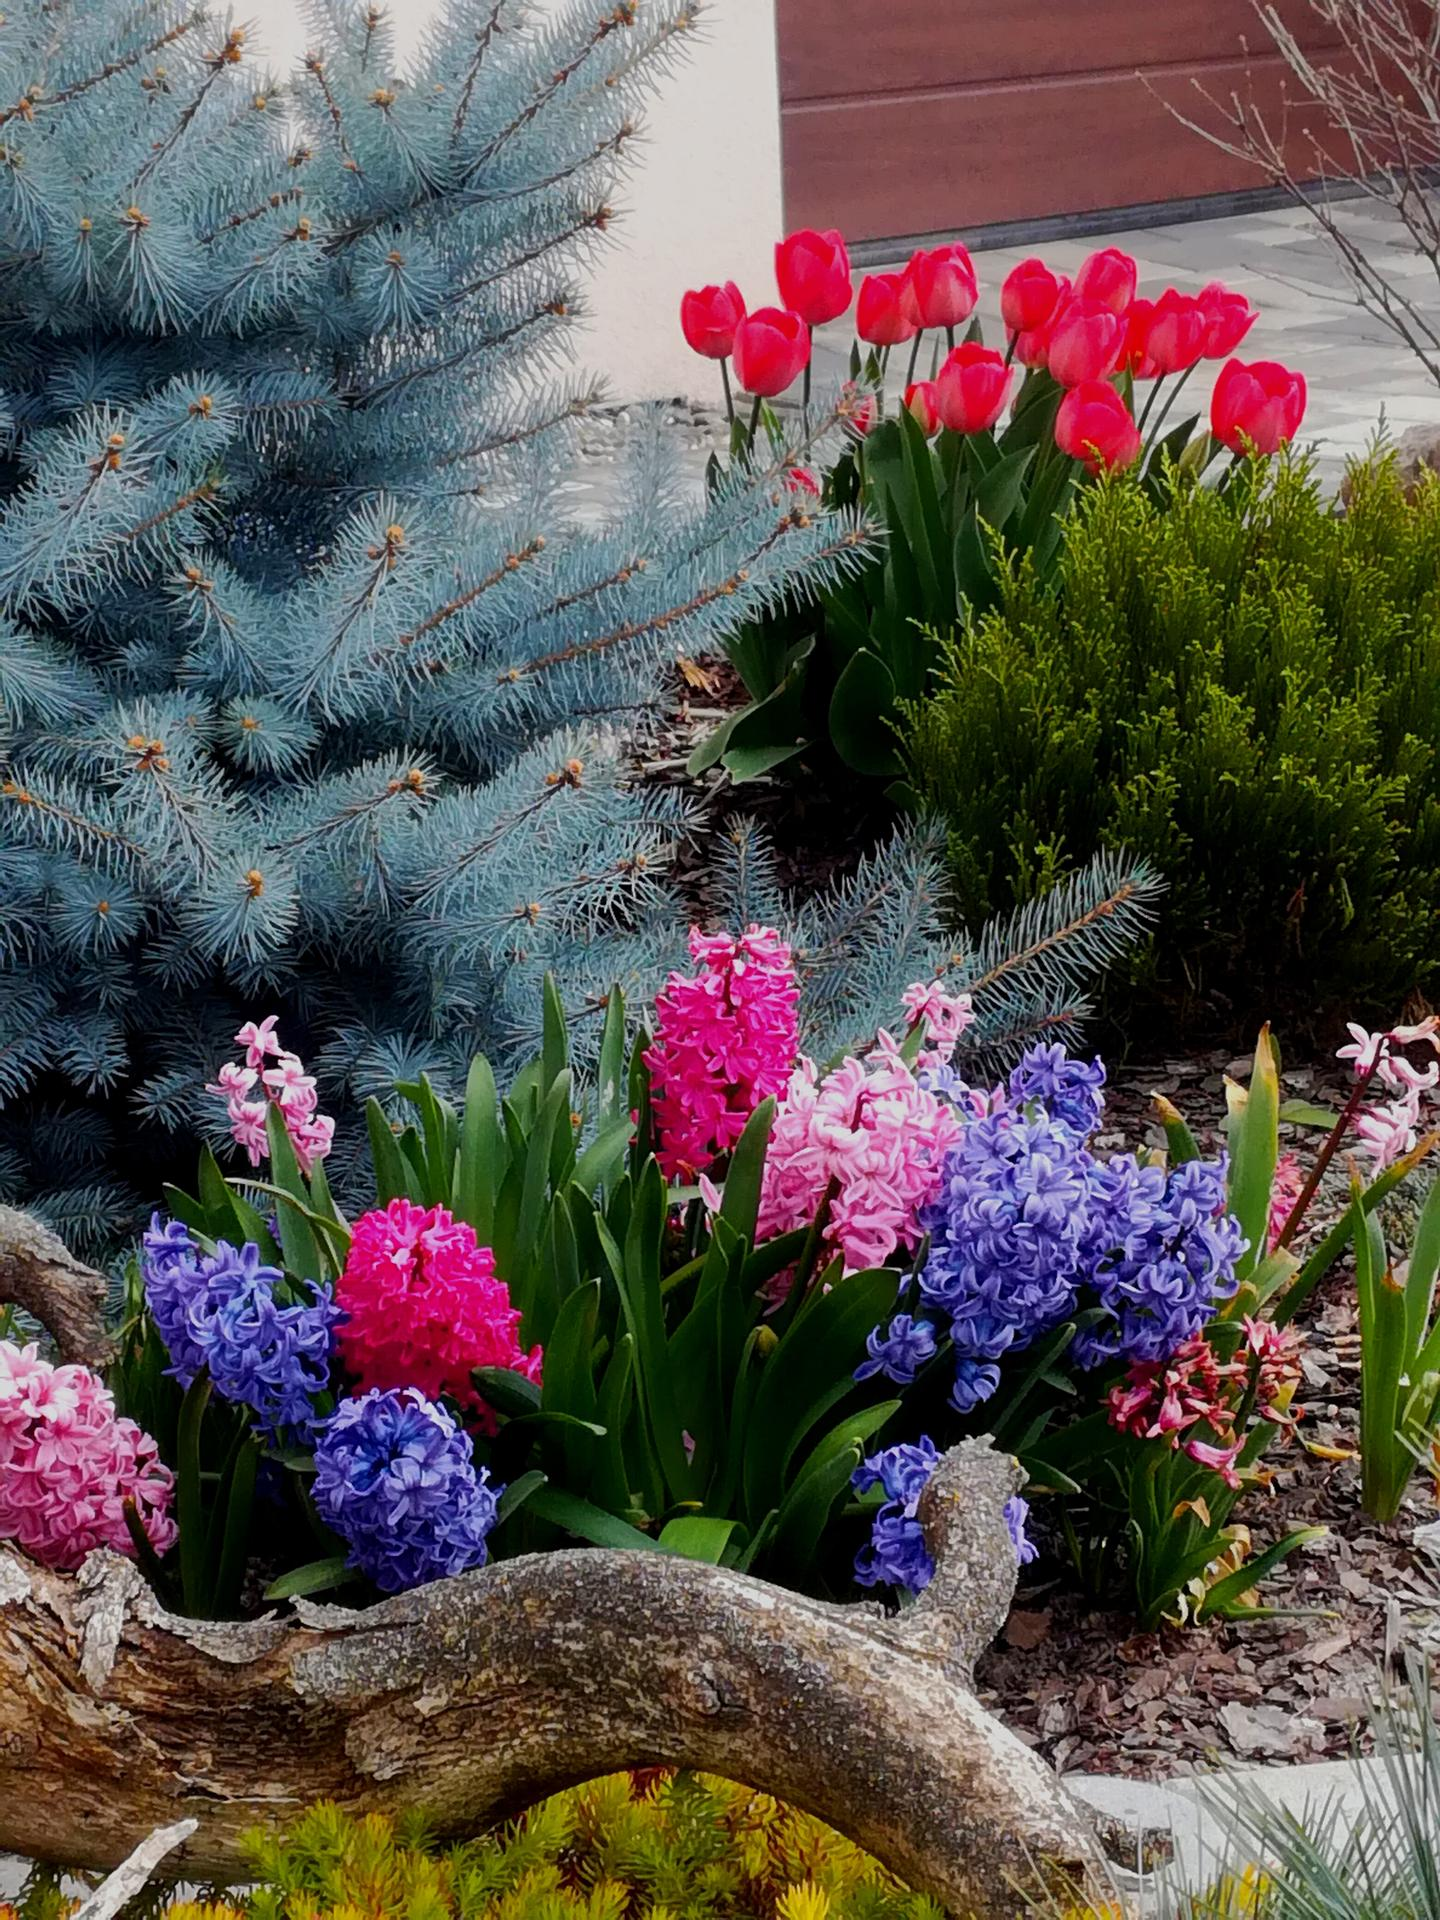 Zahrada 2021 🌲🌸🌞❤ - Obrázek č. 35